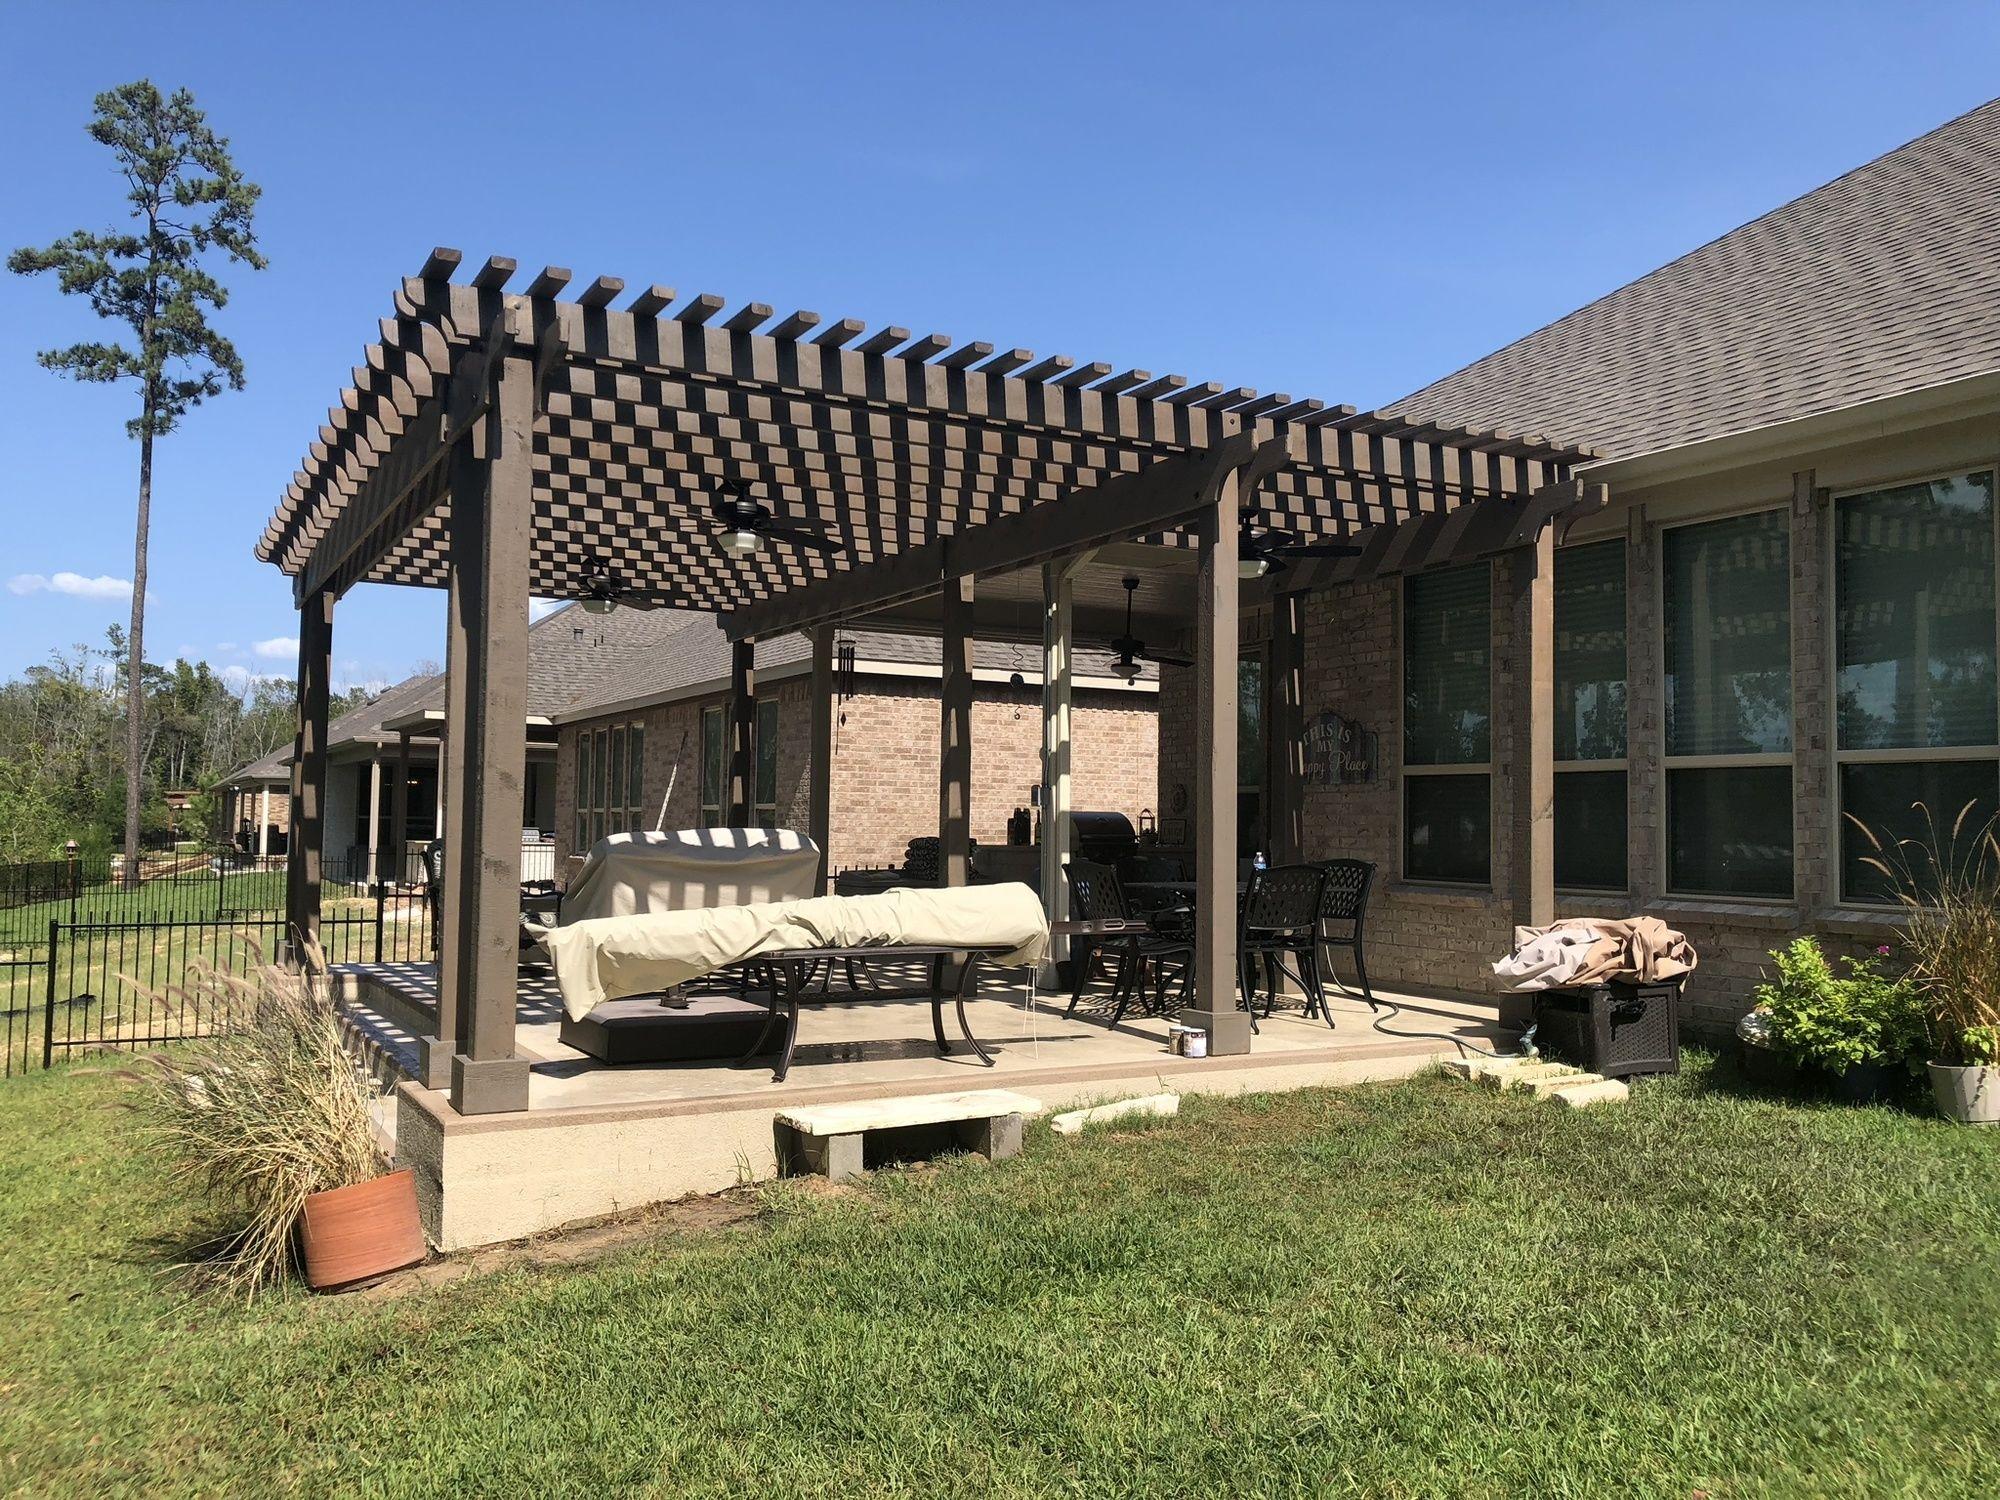 Pergolas & Gazebos - Primo Outdoor Living on Primo Outdoor Living  id=31304